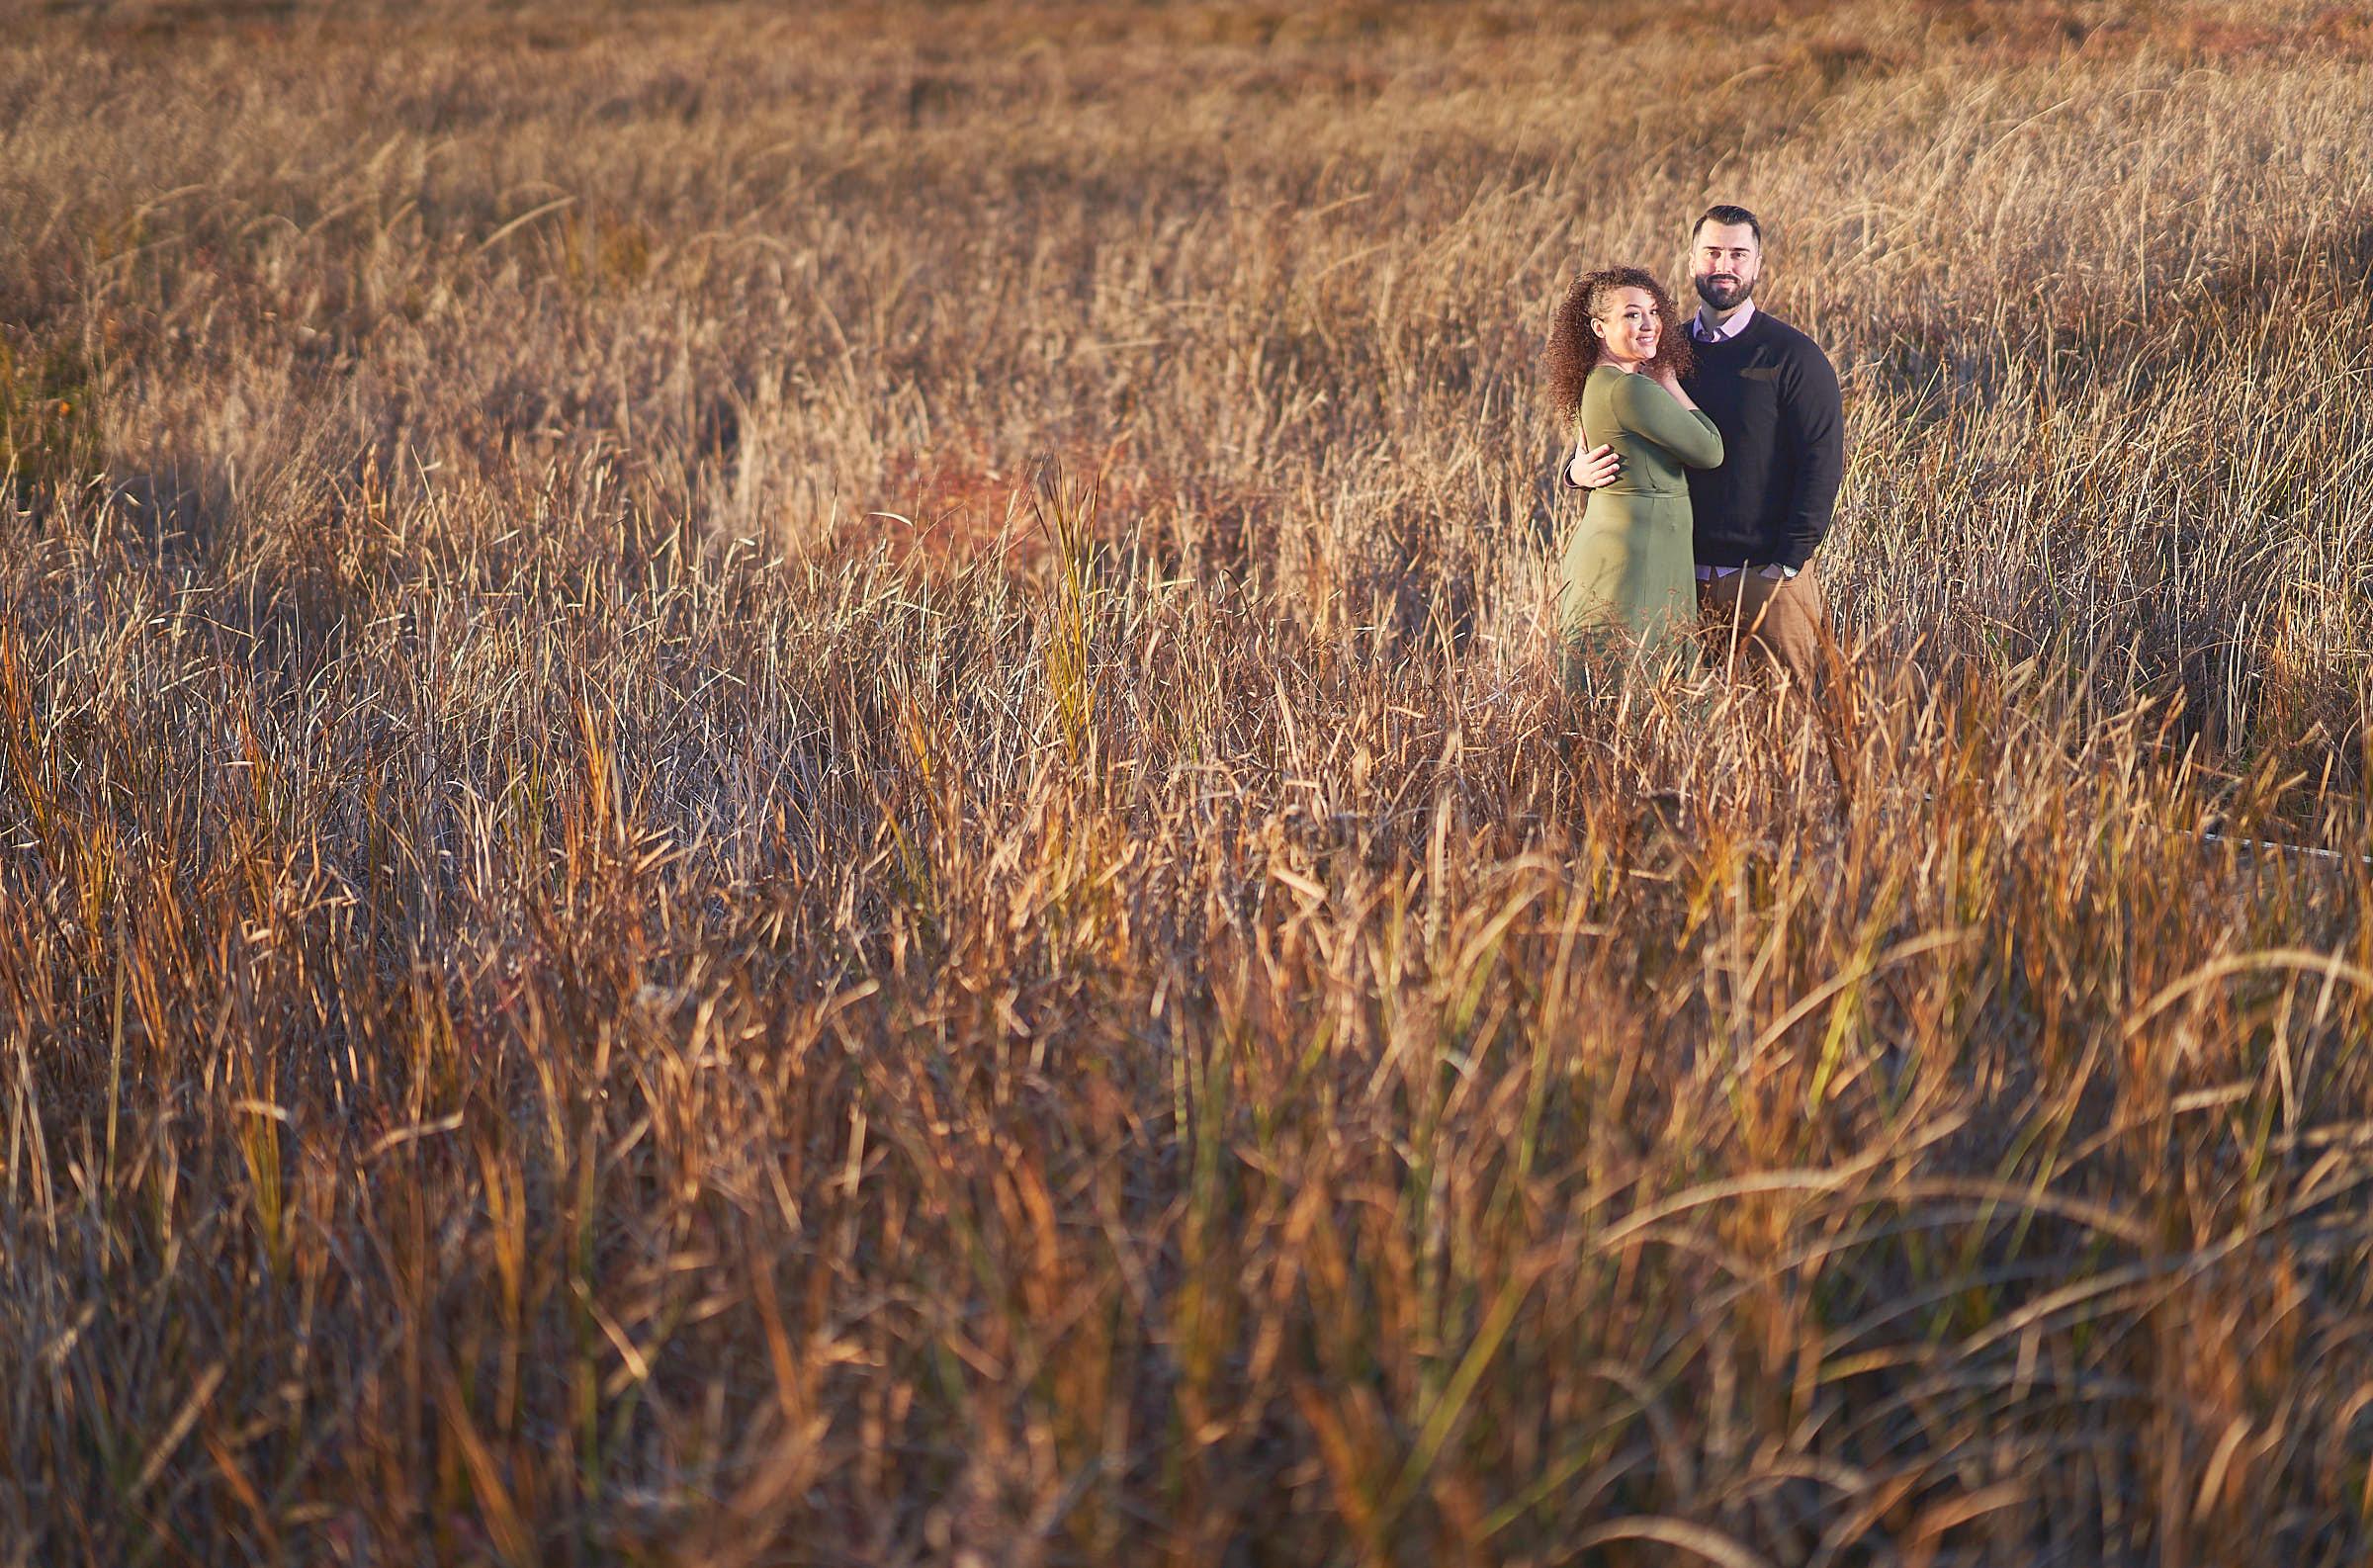 San Francisco Couples Photoshoot By Afewgoodclicks